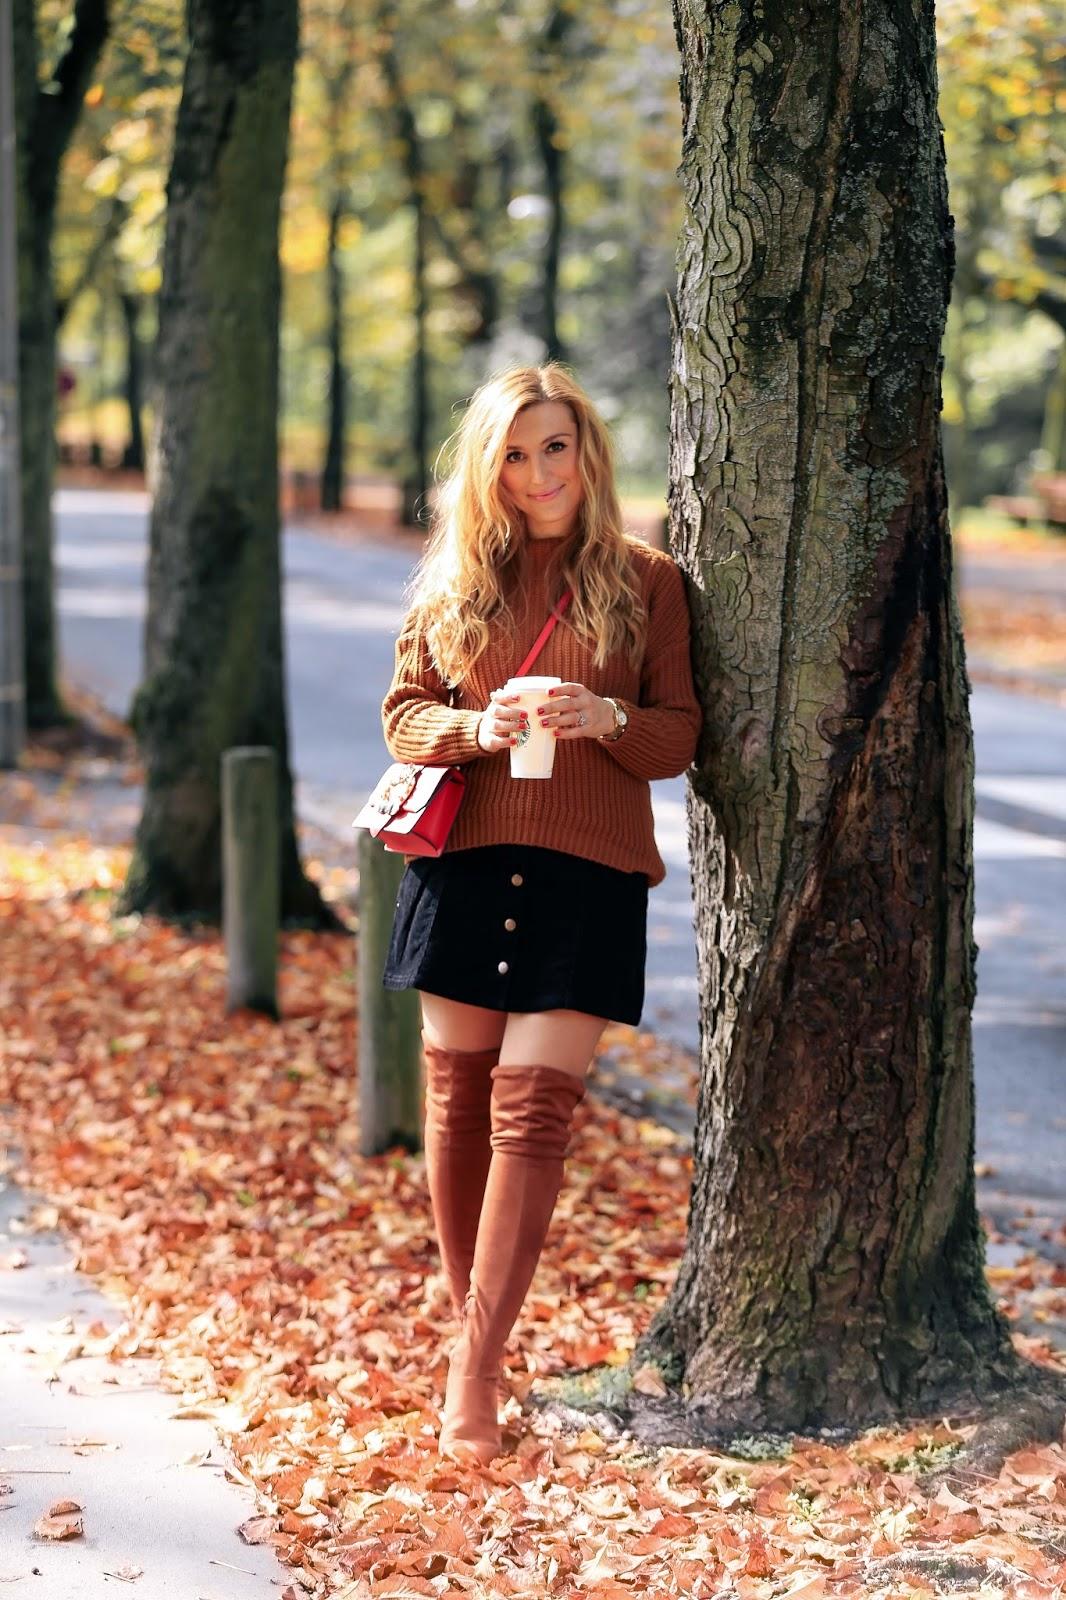 Fashionstylebyjohanna-overknees-Fashionstylebyjohanna-fashionblog-Frankfurt-blogger-fashionblogger-Deutschland-bloggerdeutschland-lifestyleblog-modeblog-germanblogger-styleblog-cordrock